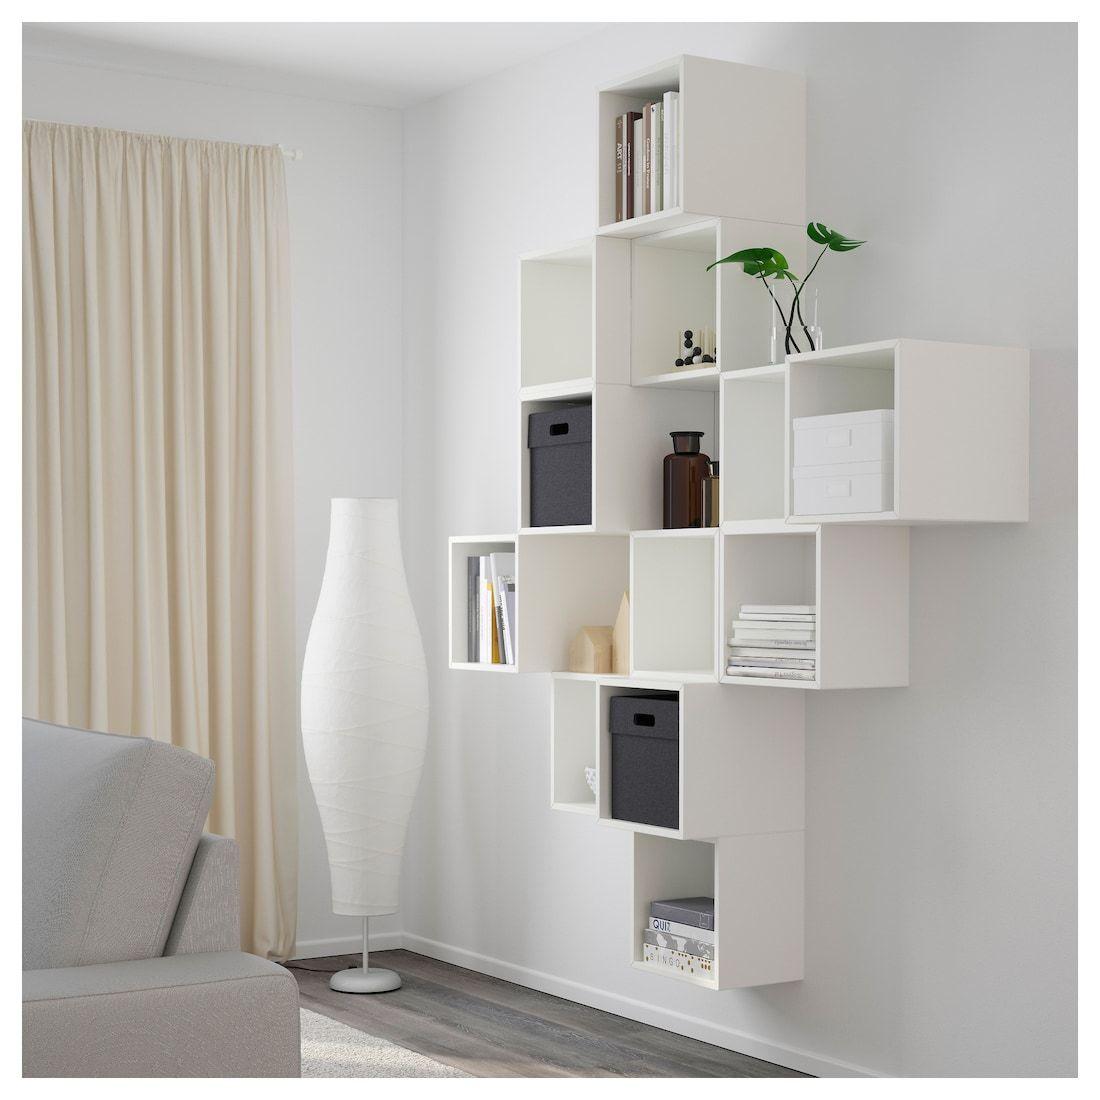 Eket Wall Mounted Cabinet Combination White Length 27 Learn More Ikea In 2020 Cube Furniture Wall Mounted Cabinet Ikea Eket